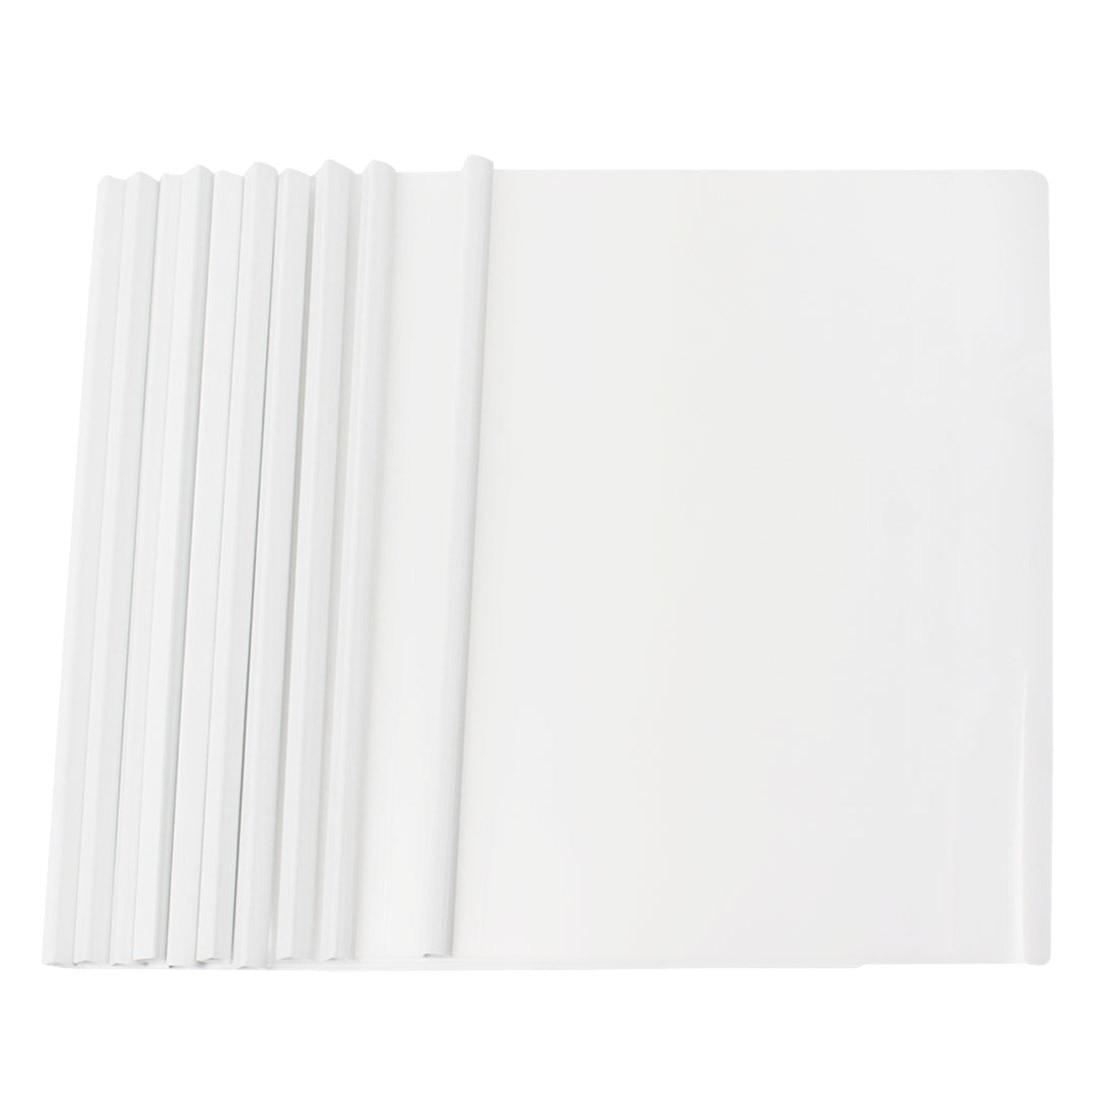 10 Pcs white Plastic Sliding Bar File Folder for A4 Paper Report